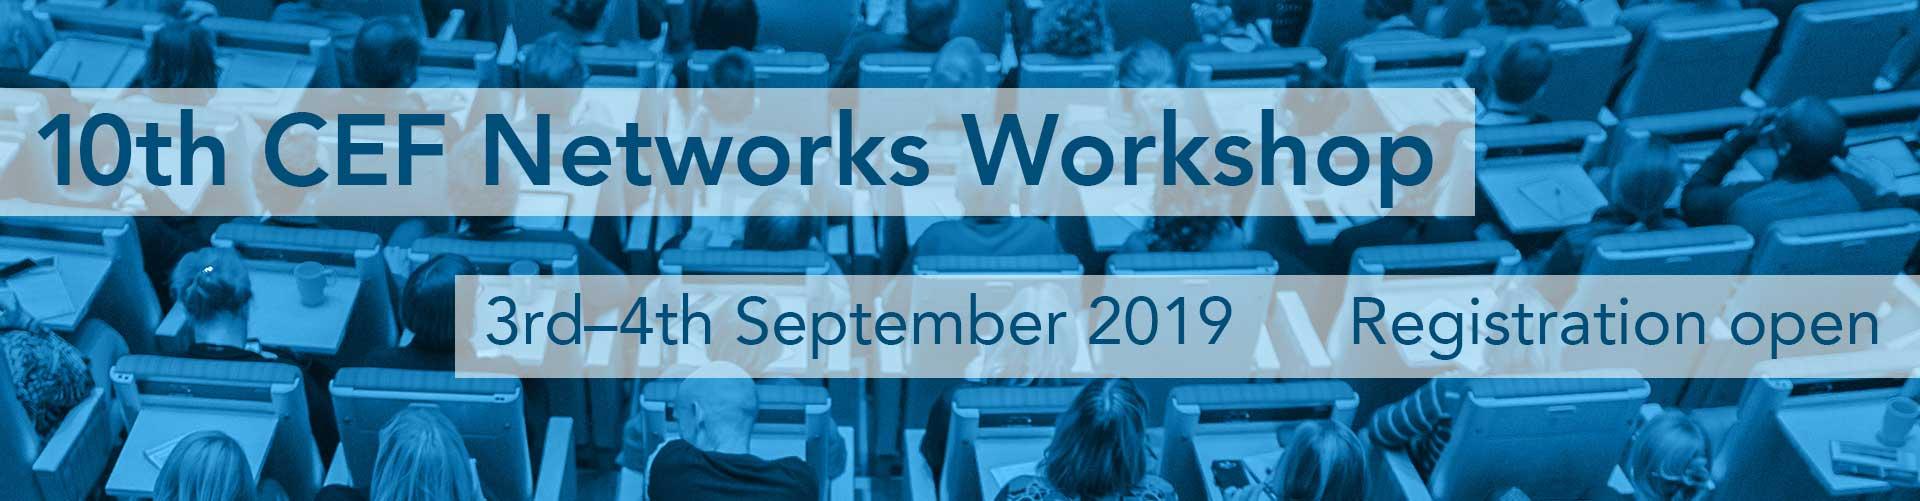 10th CEF Networks Workshop